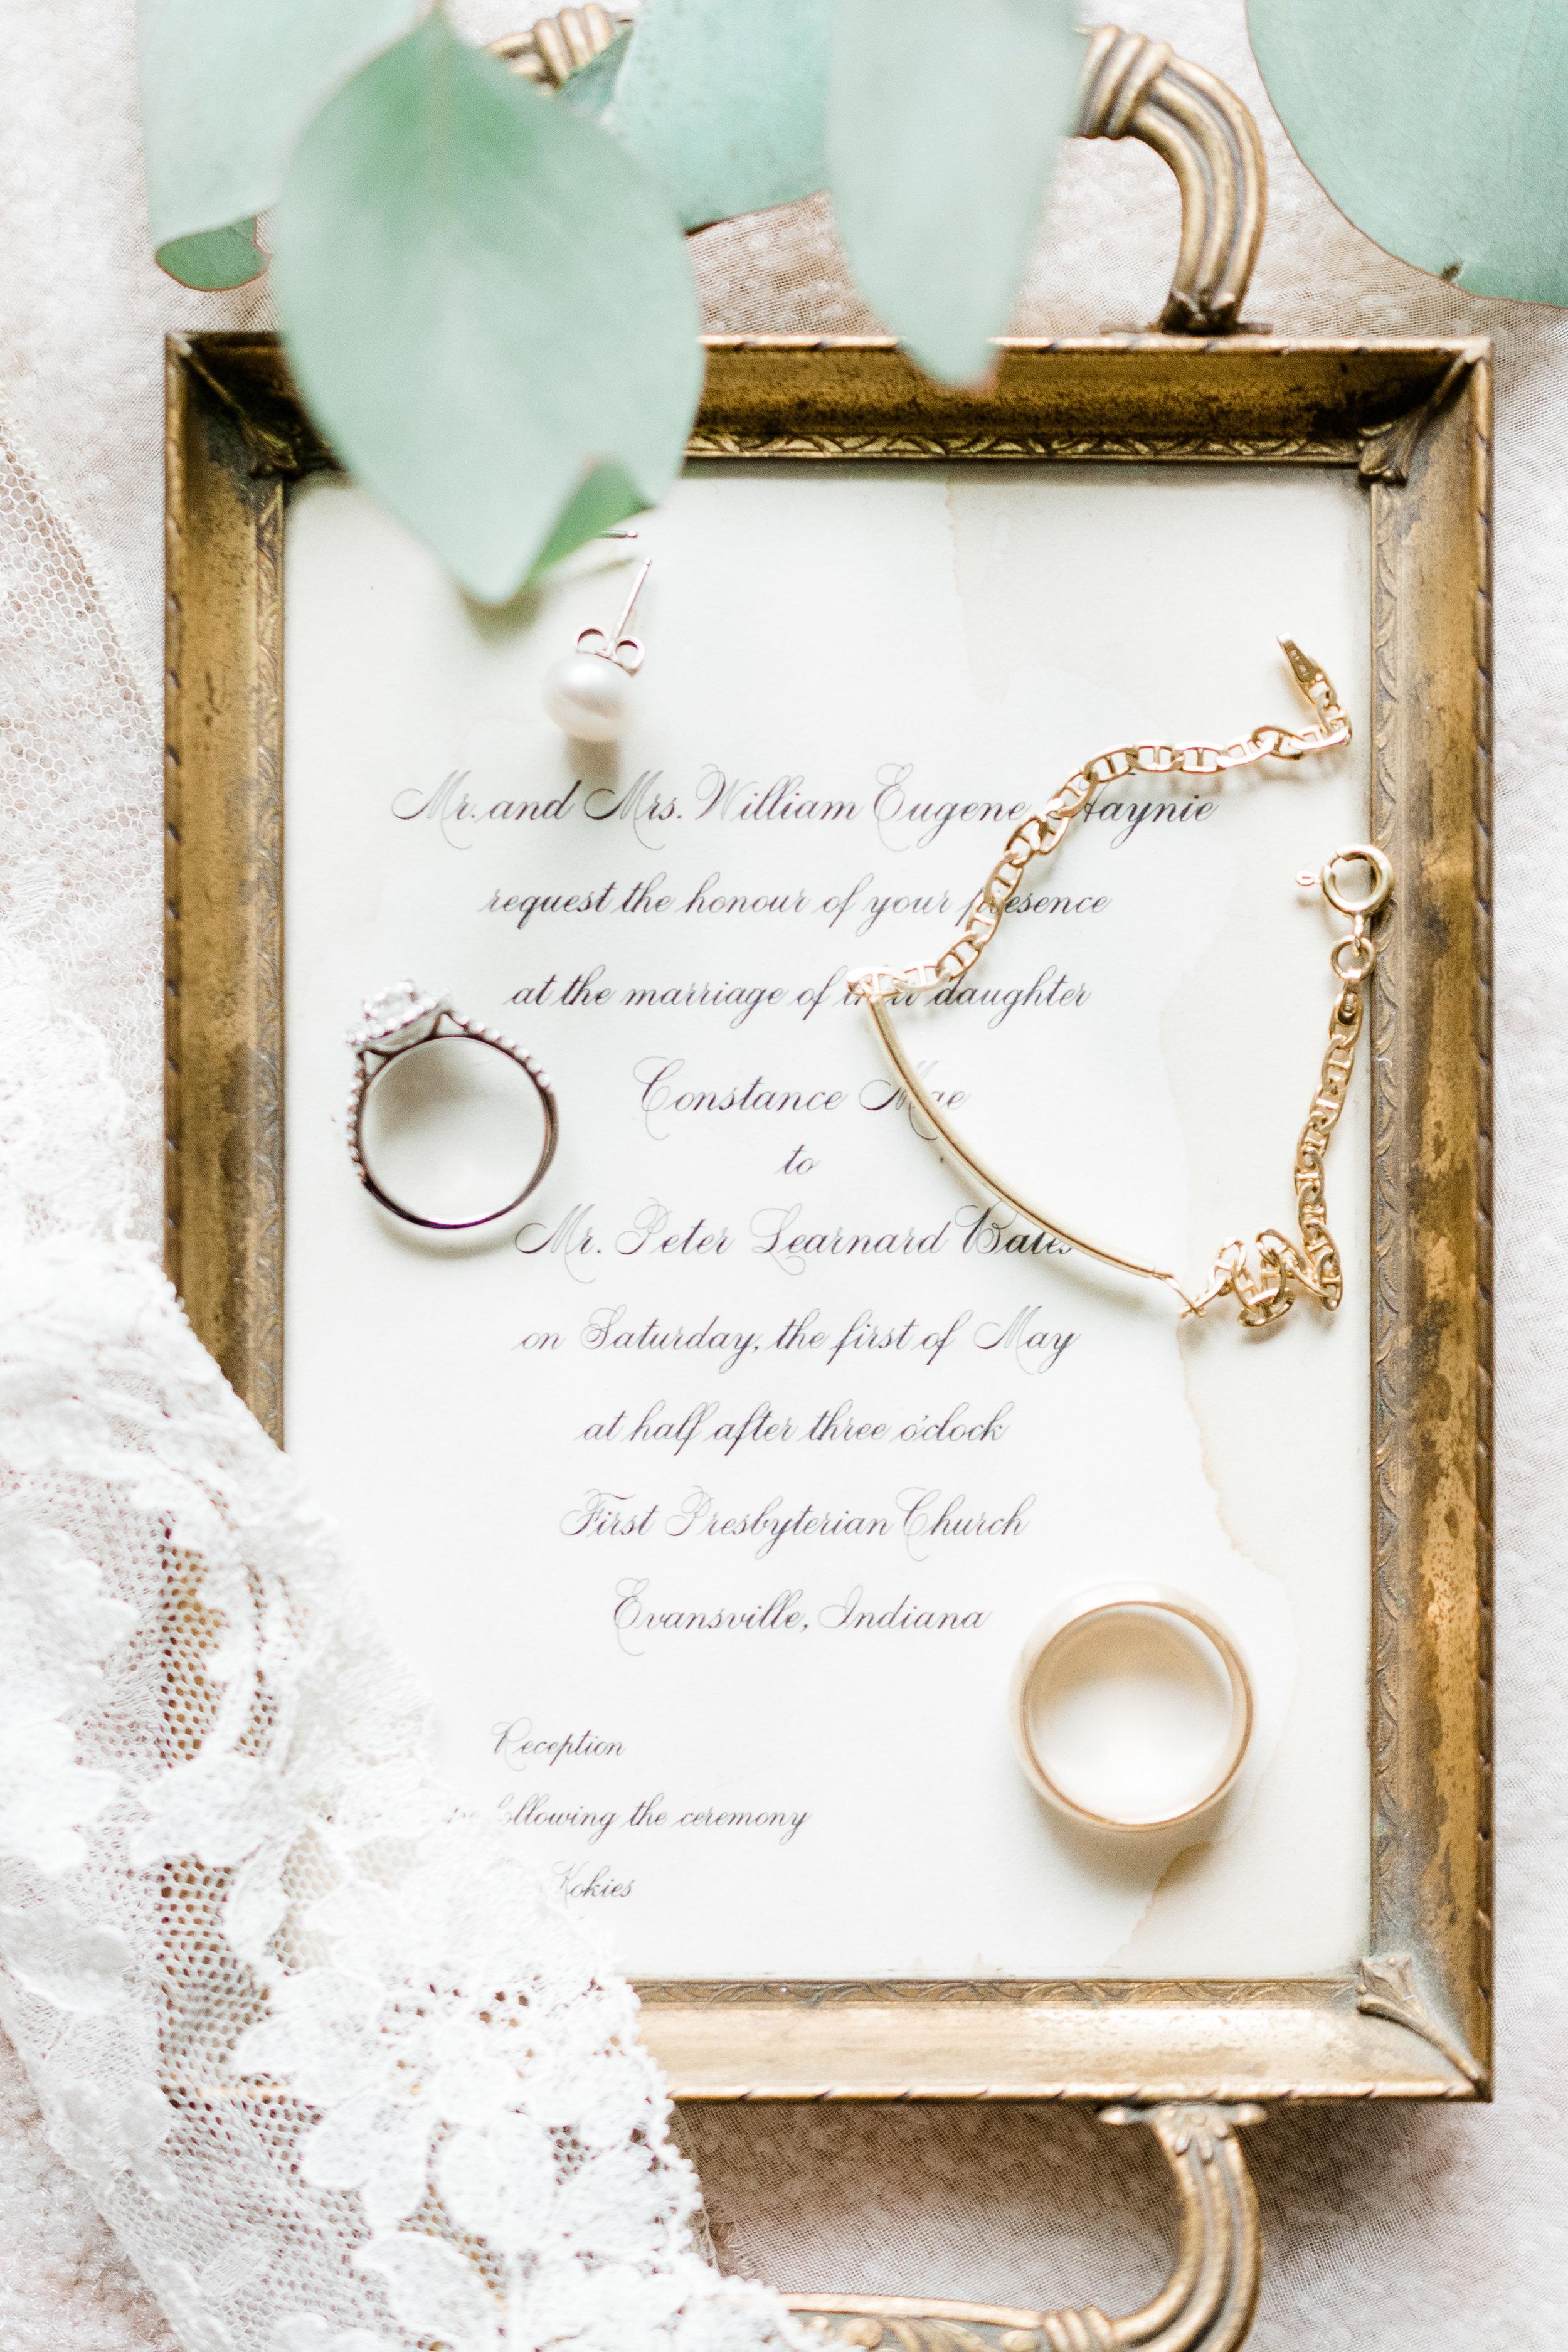 Anthony-and-stork-Weddings-53.jpg